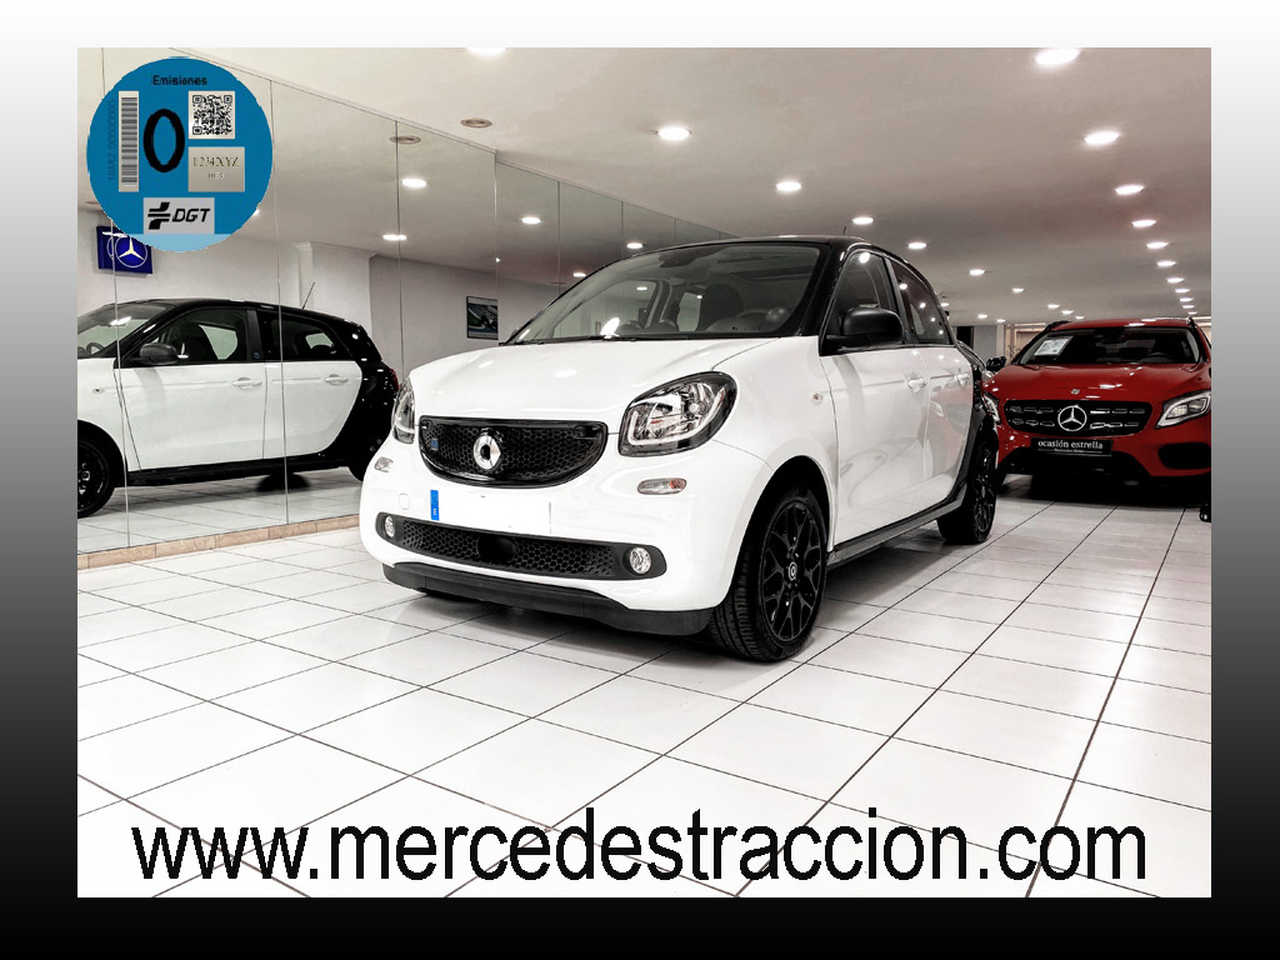 Smart Forfour 81CV EQ /Passion/Paquete Deportivo/ 1.900 km   - Foto 1